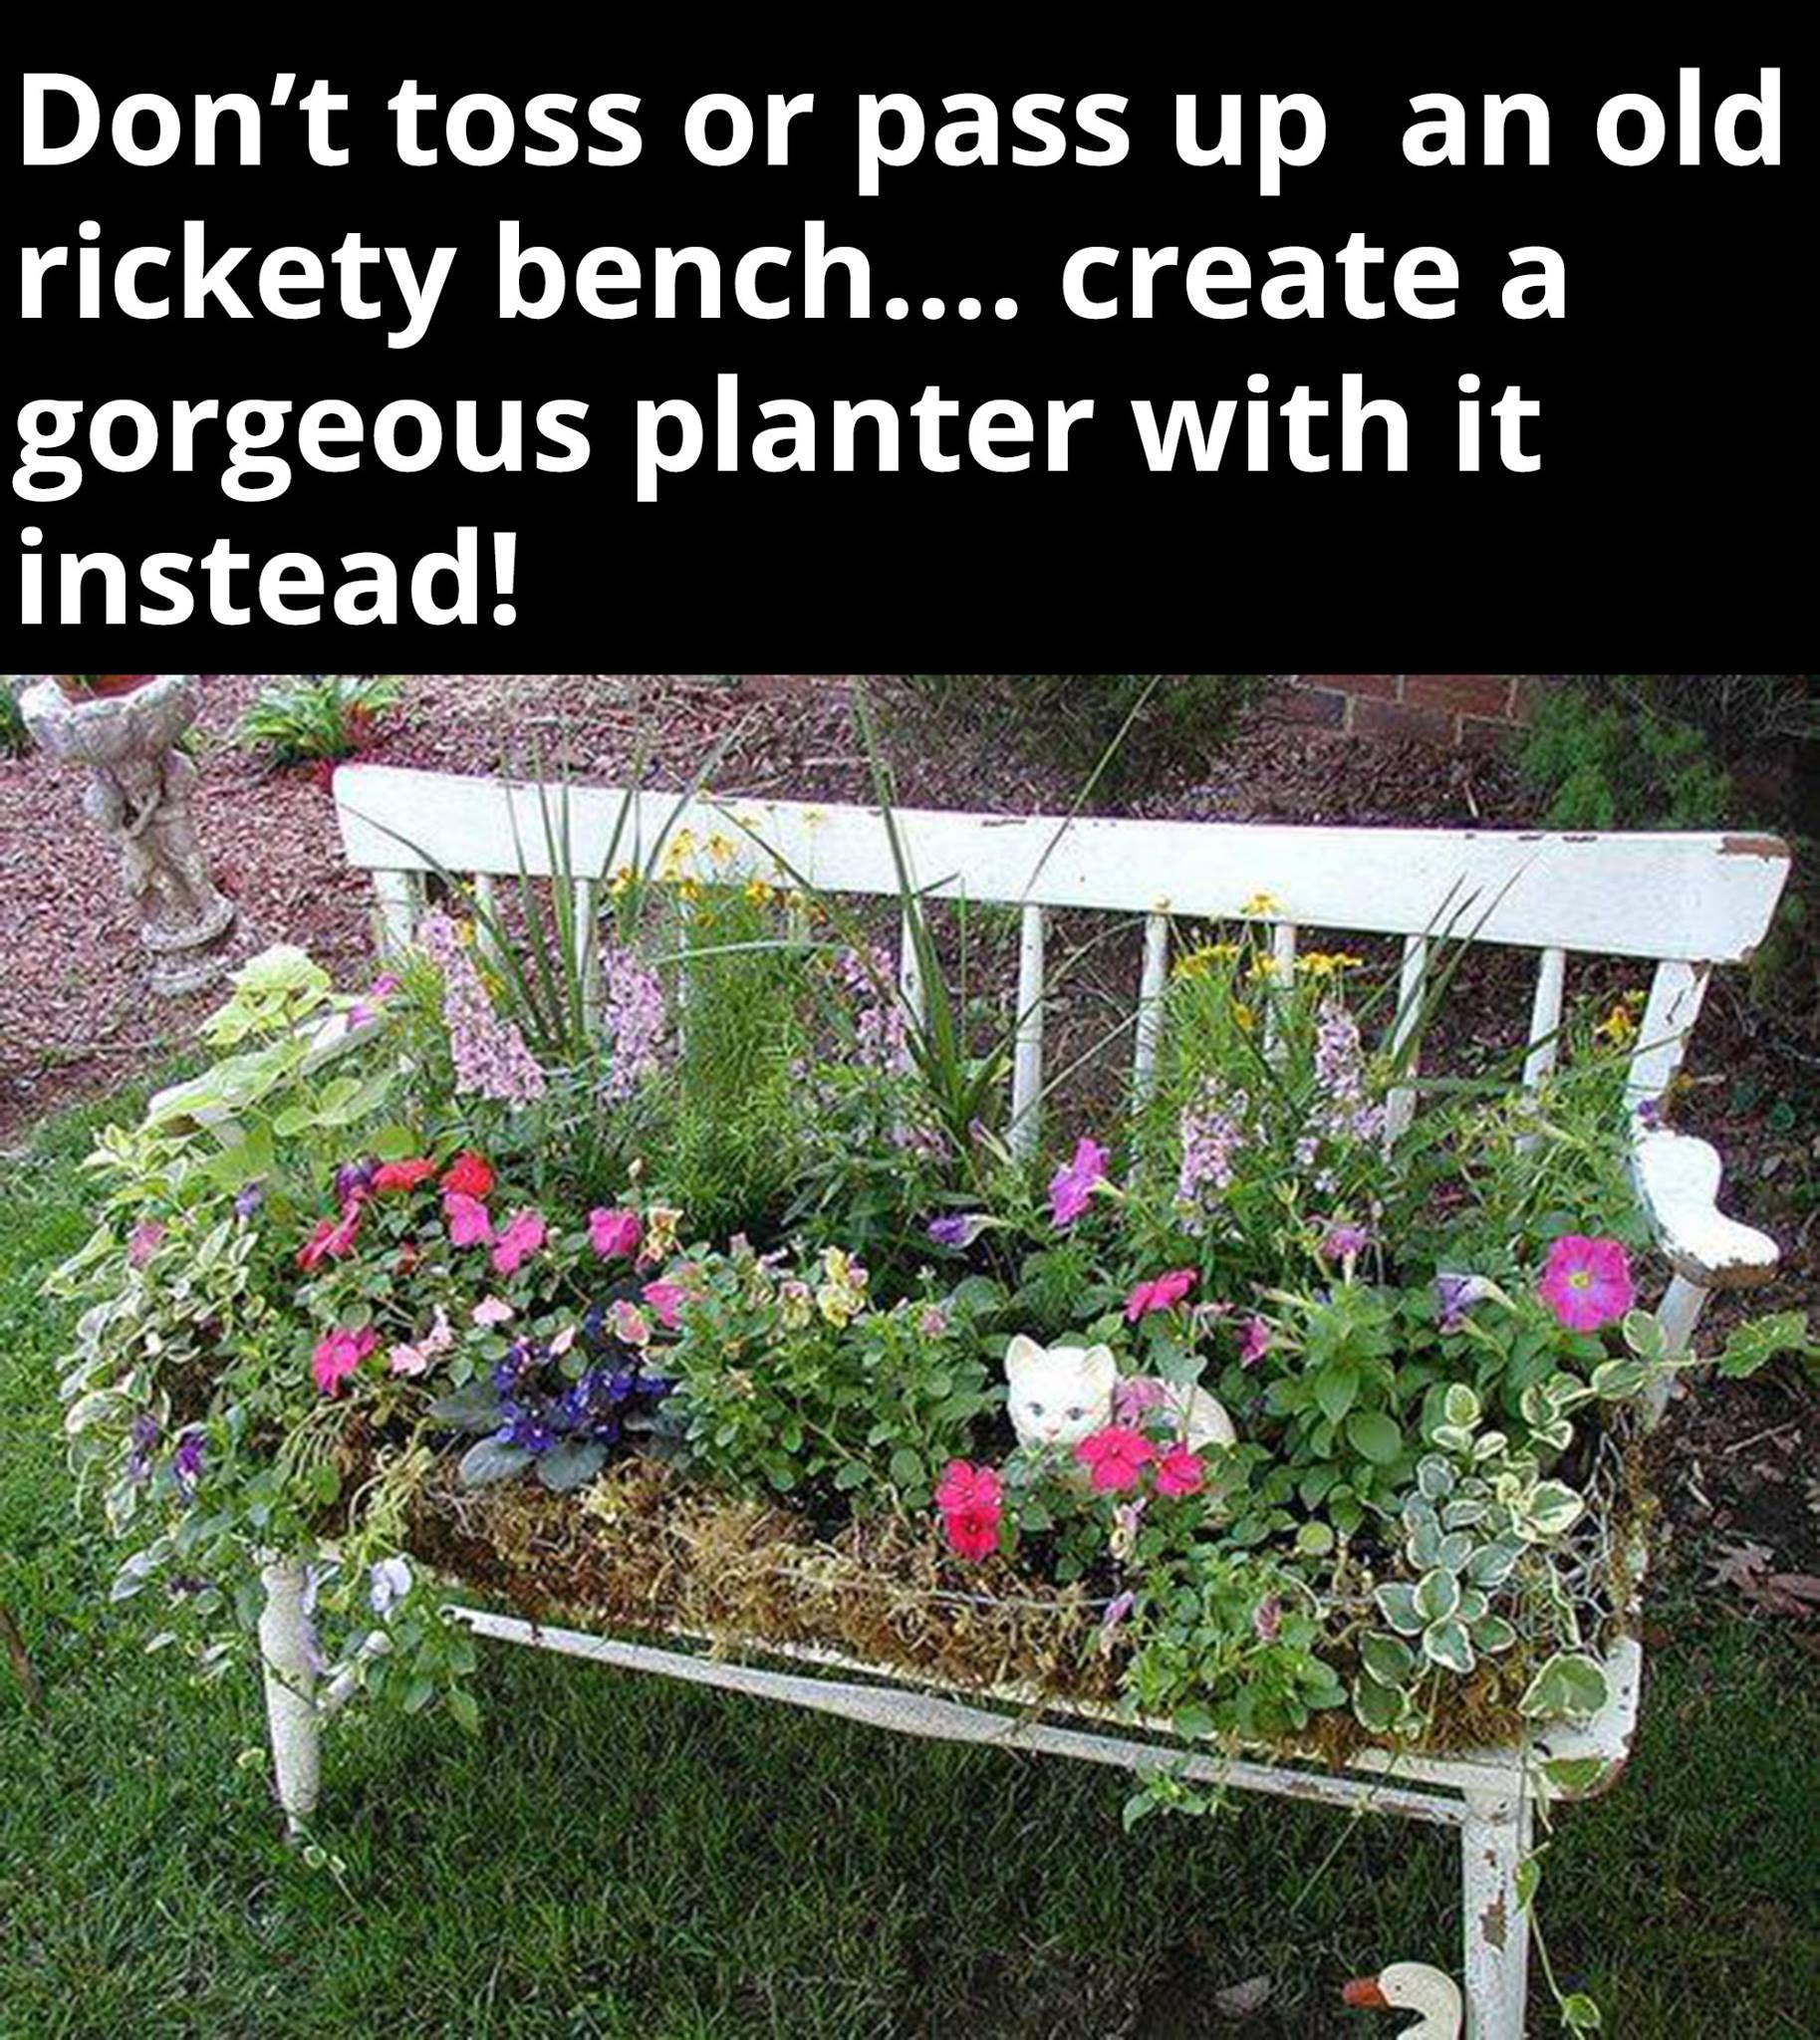 Pin by Holly Smith on Garden, Yard & Outdoor Ideas   Pinterest ...